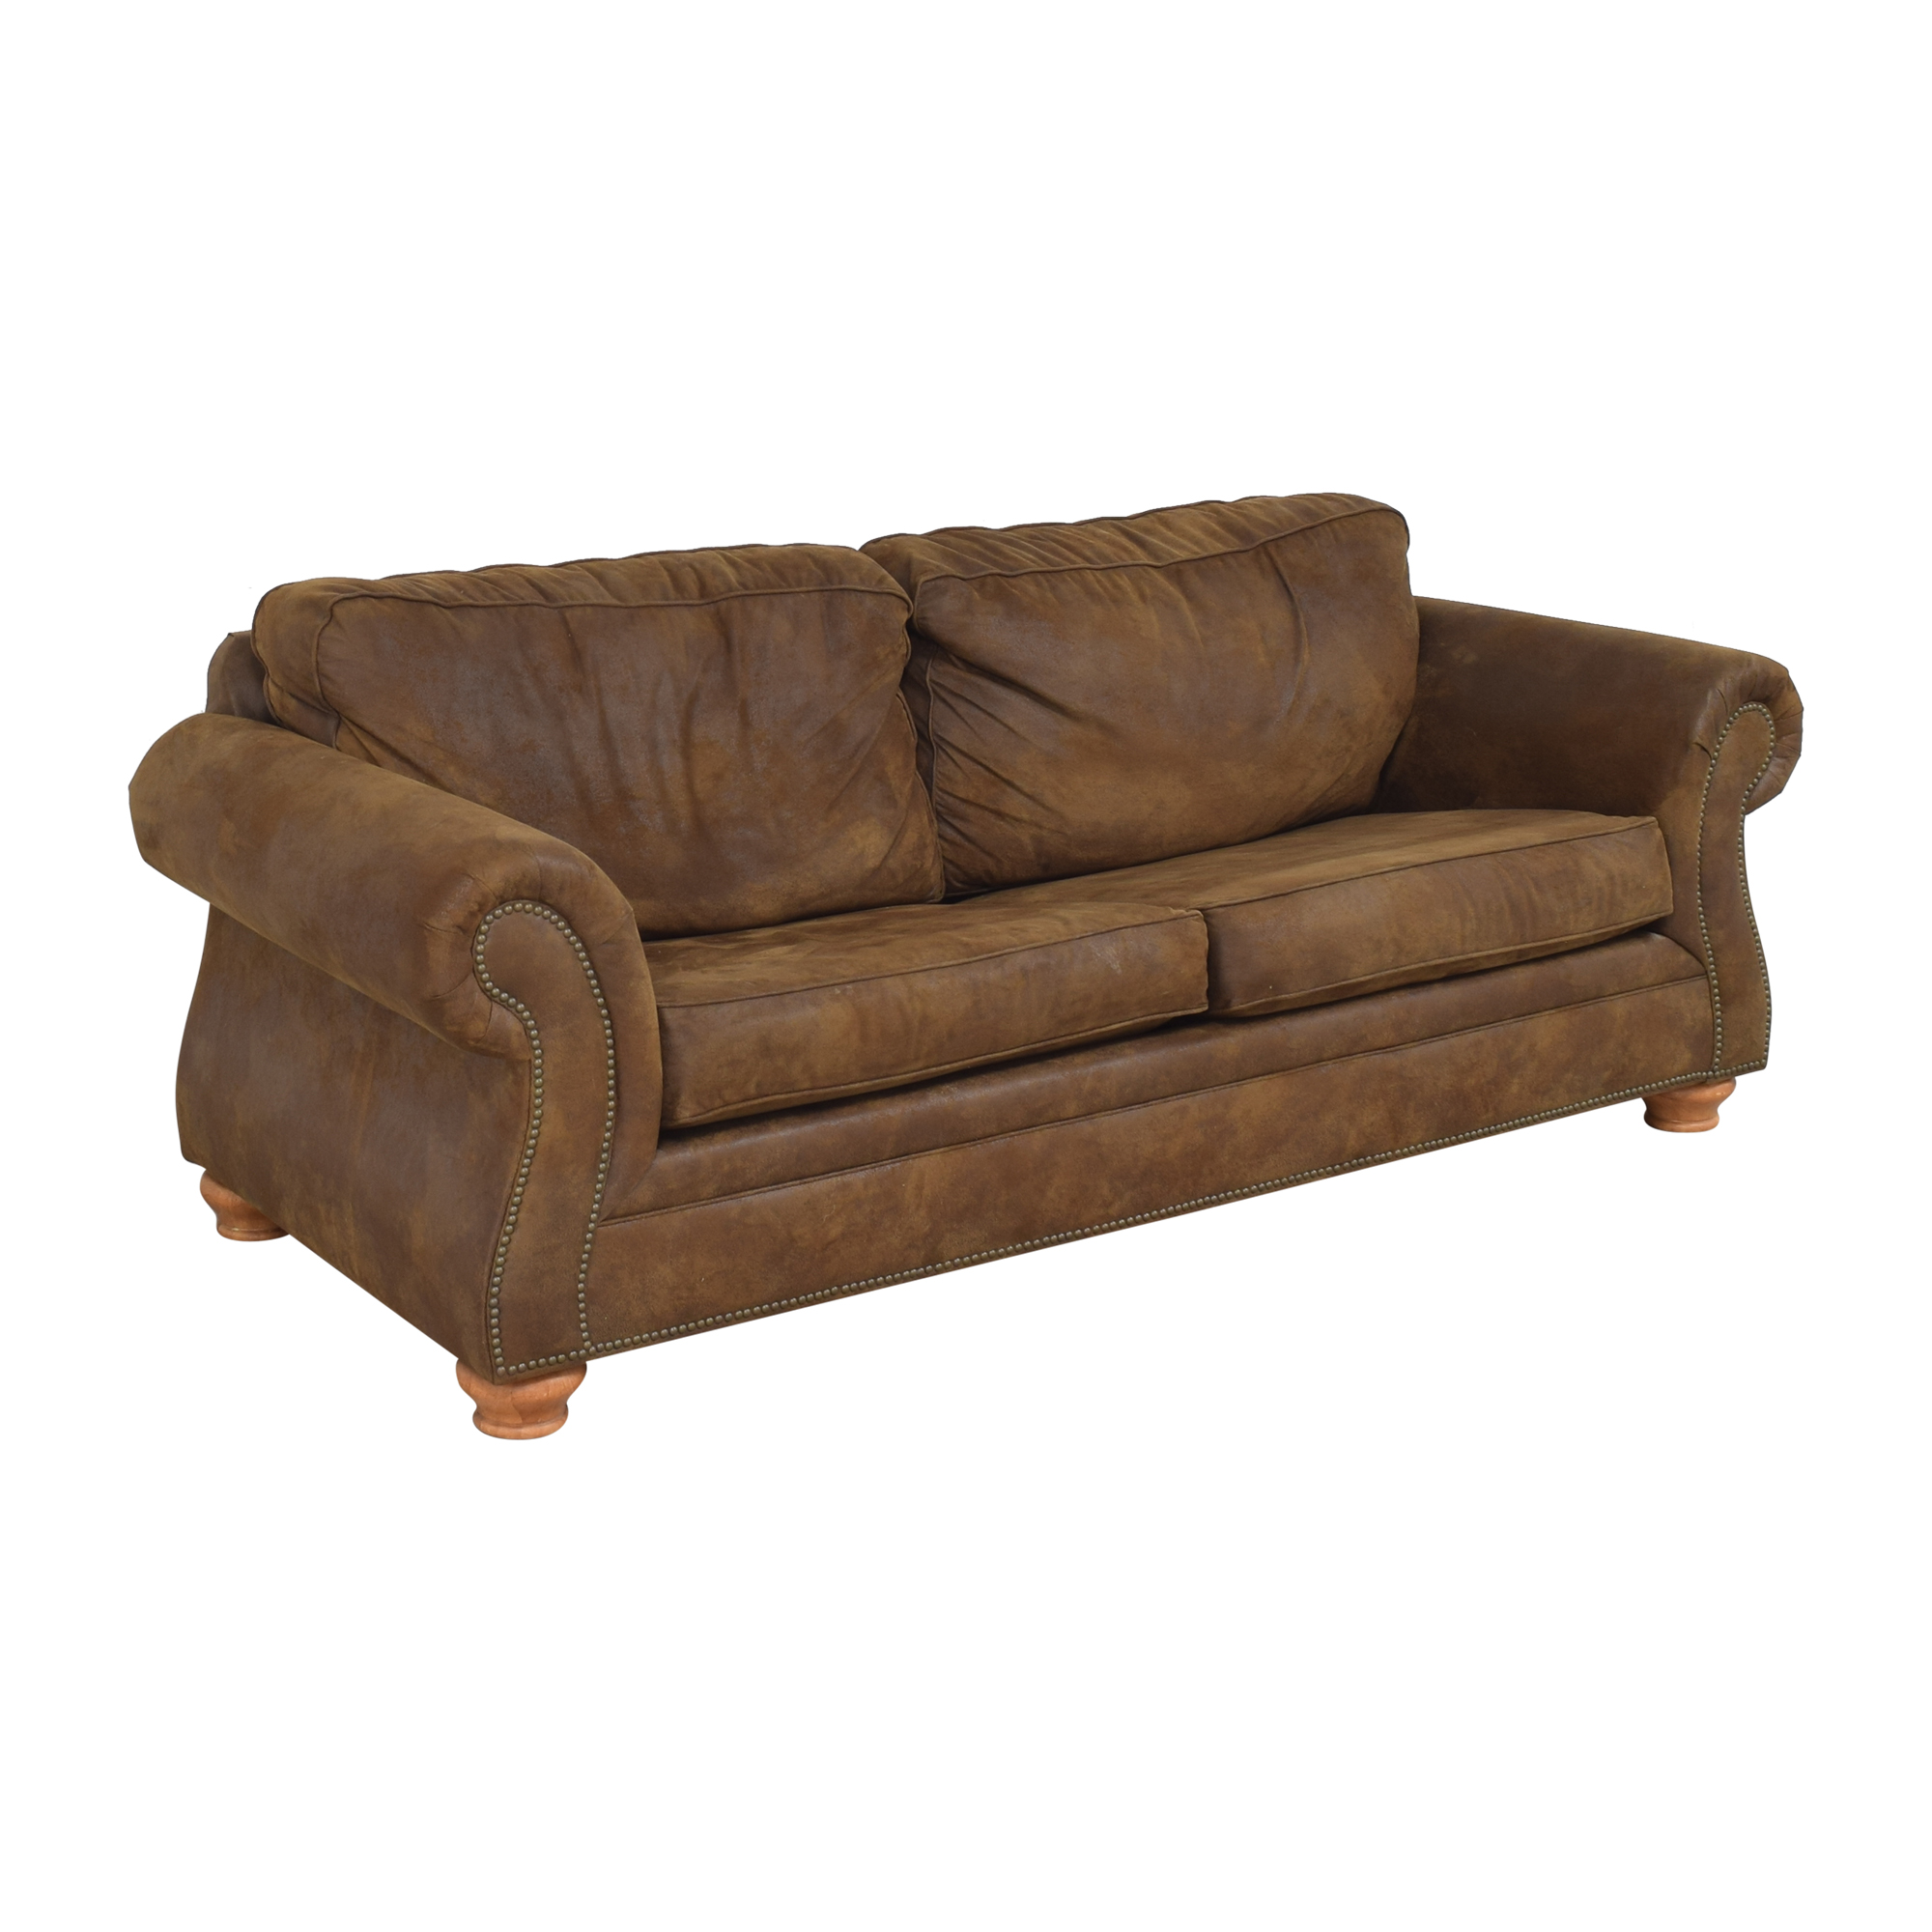 Raymour & Flanigan Canyon Ridge Sleeper Sofa sale